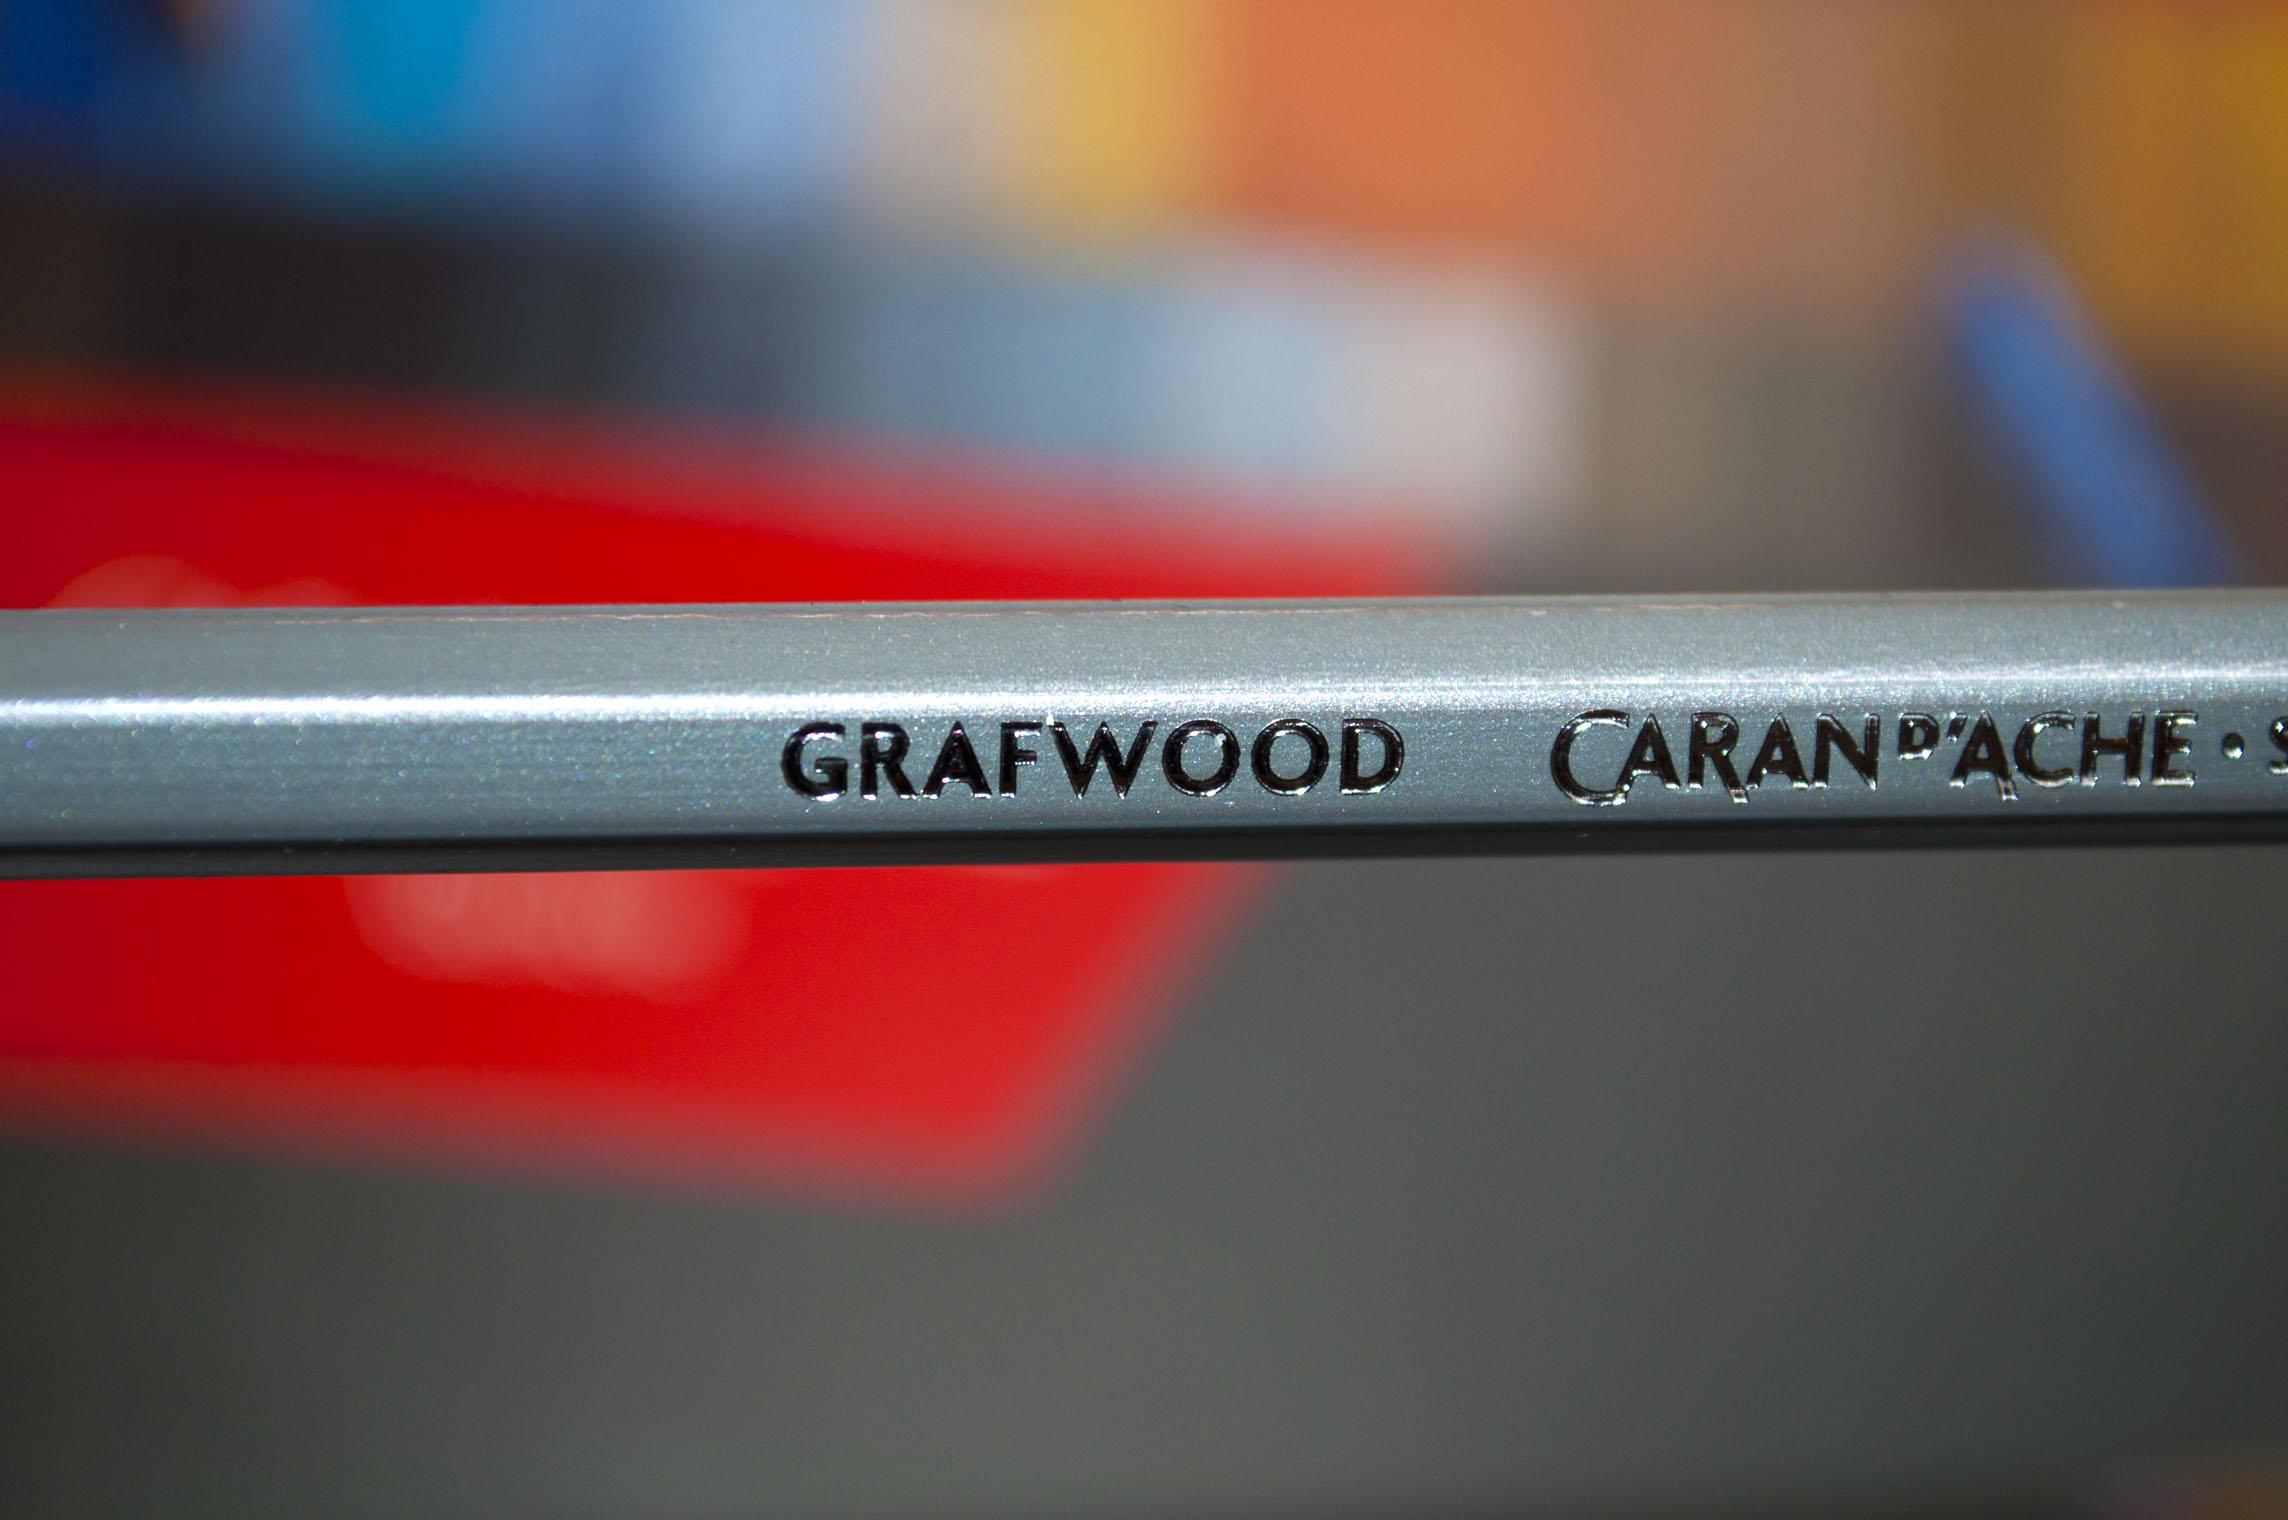 CD GRafwood name on barrel.jpg